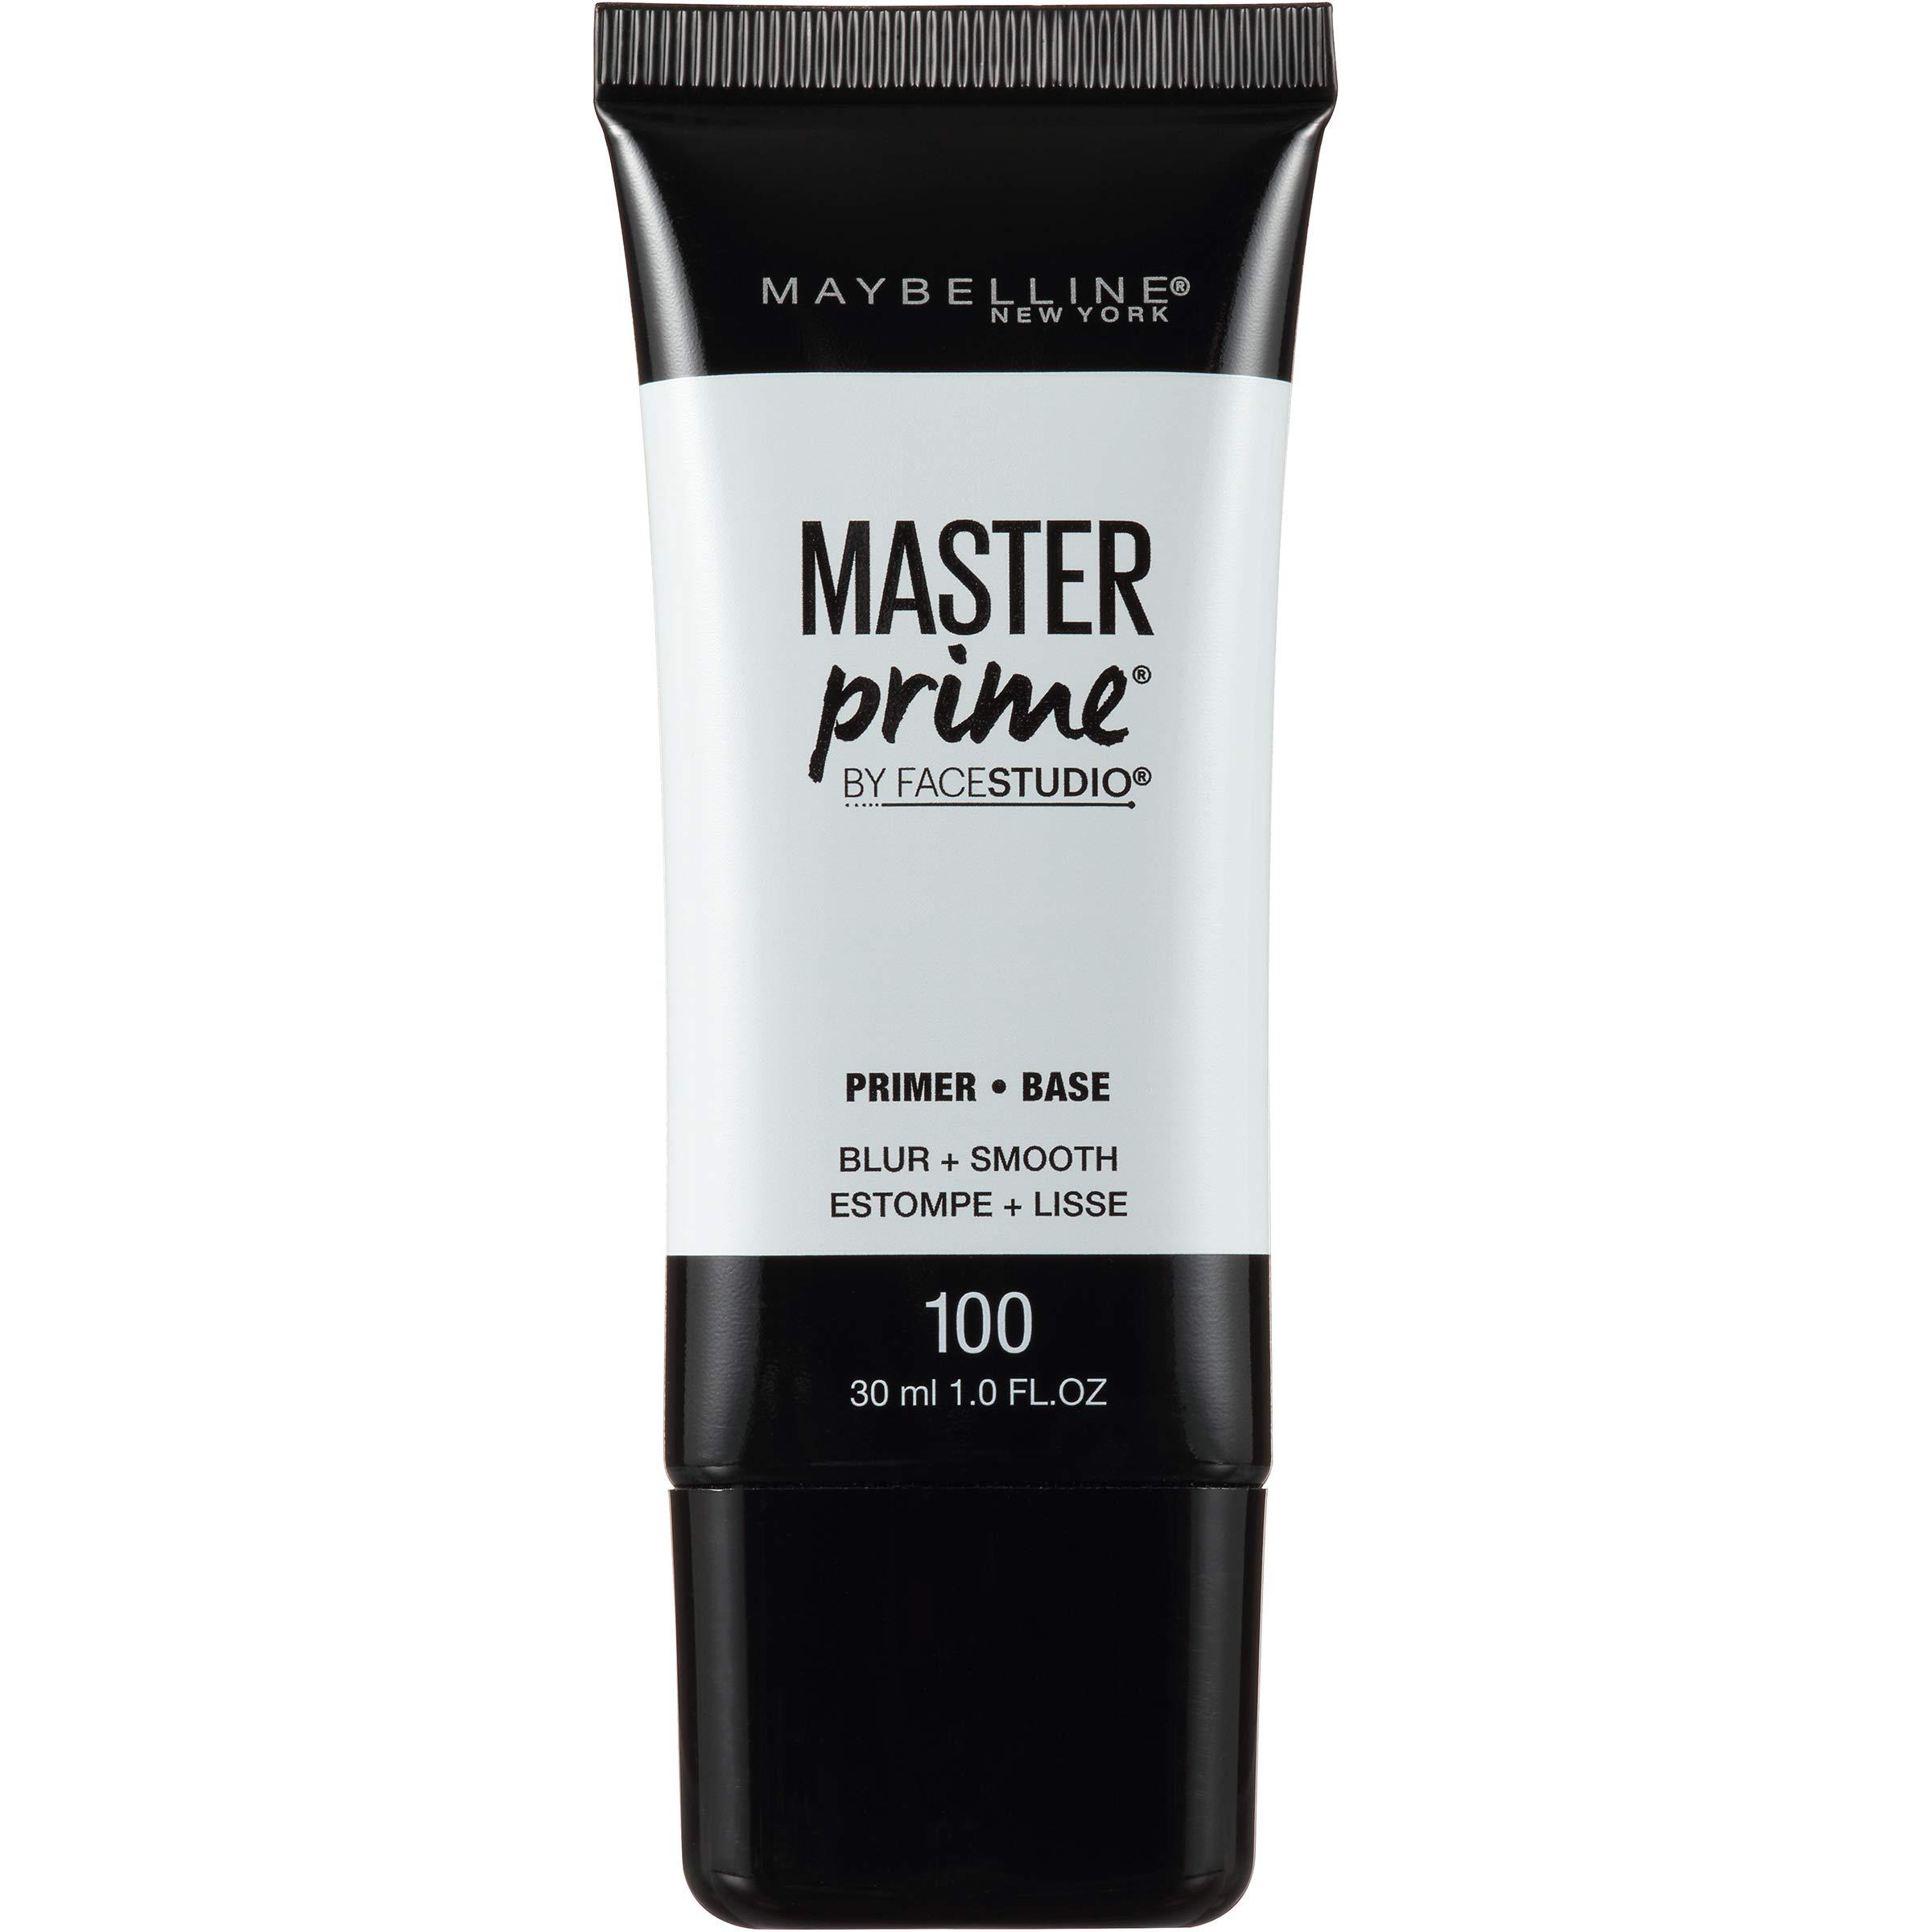 Maybelline New York Face Studio Master Prime Makeup - Blur plus Smooth